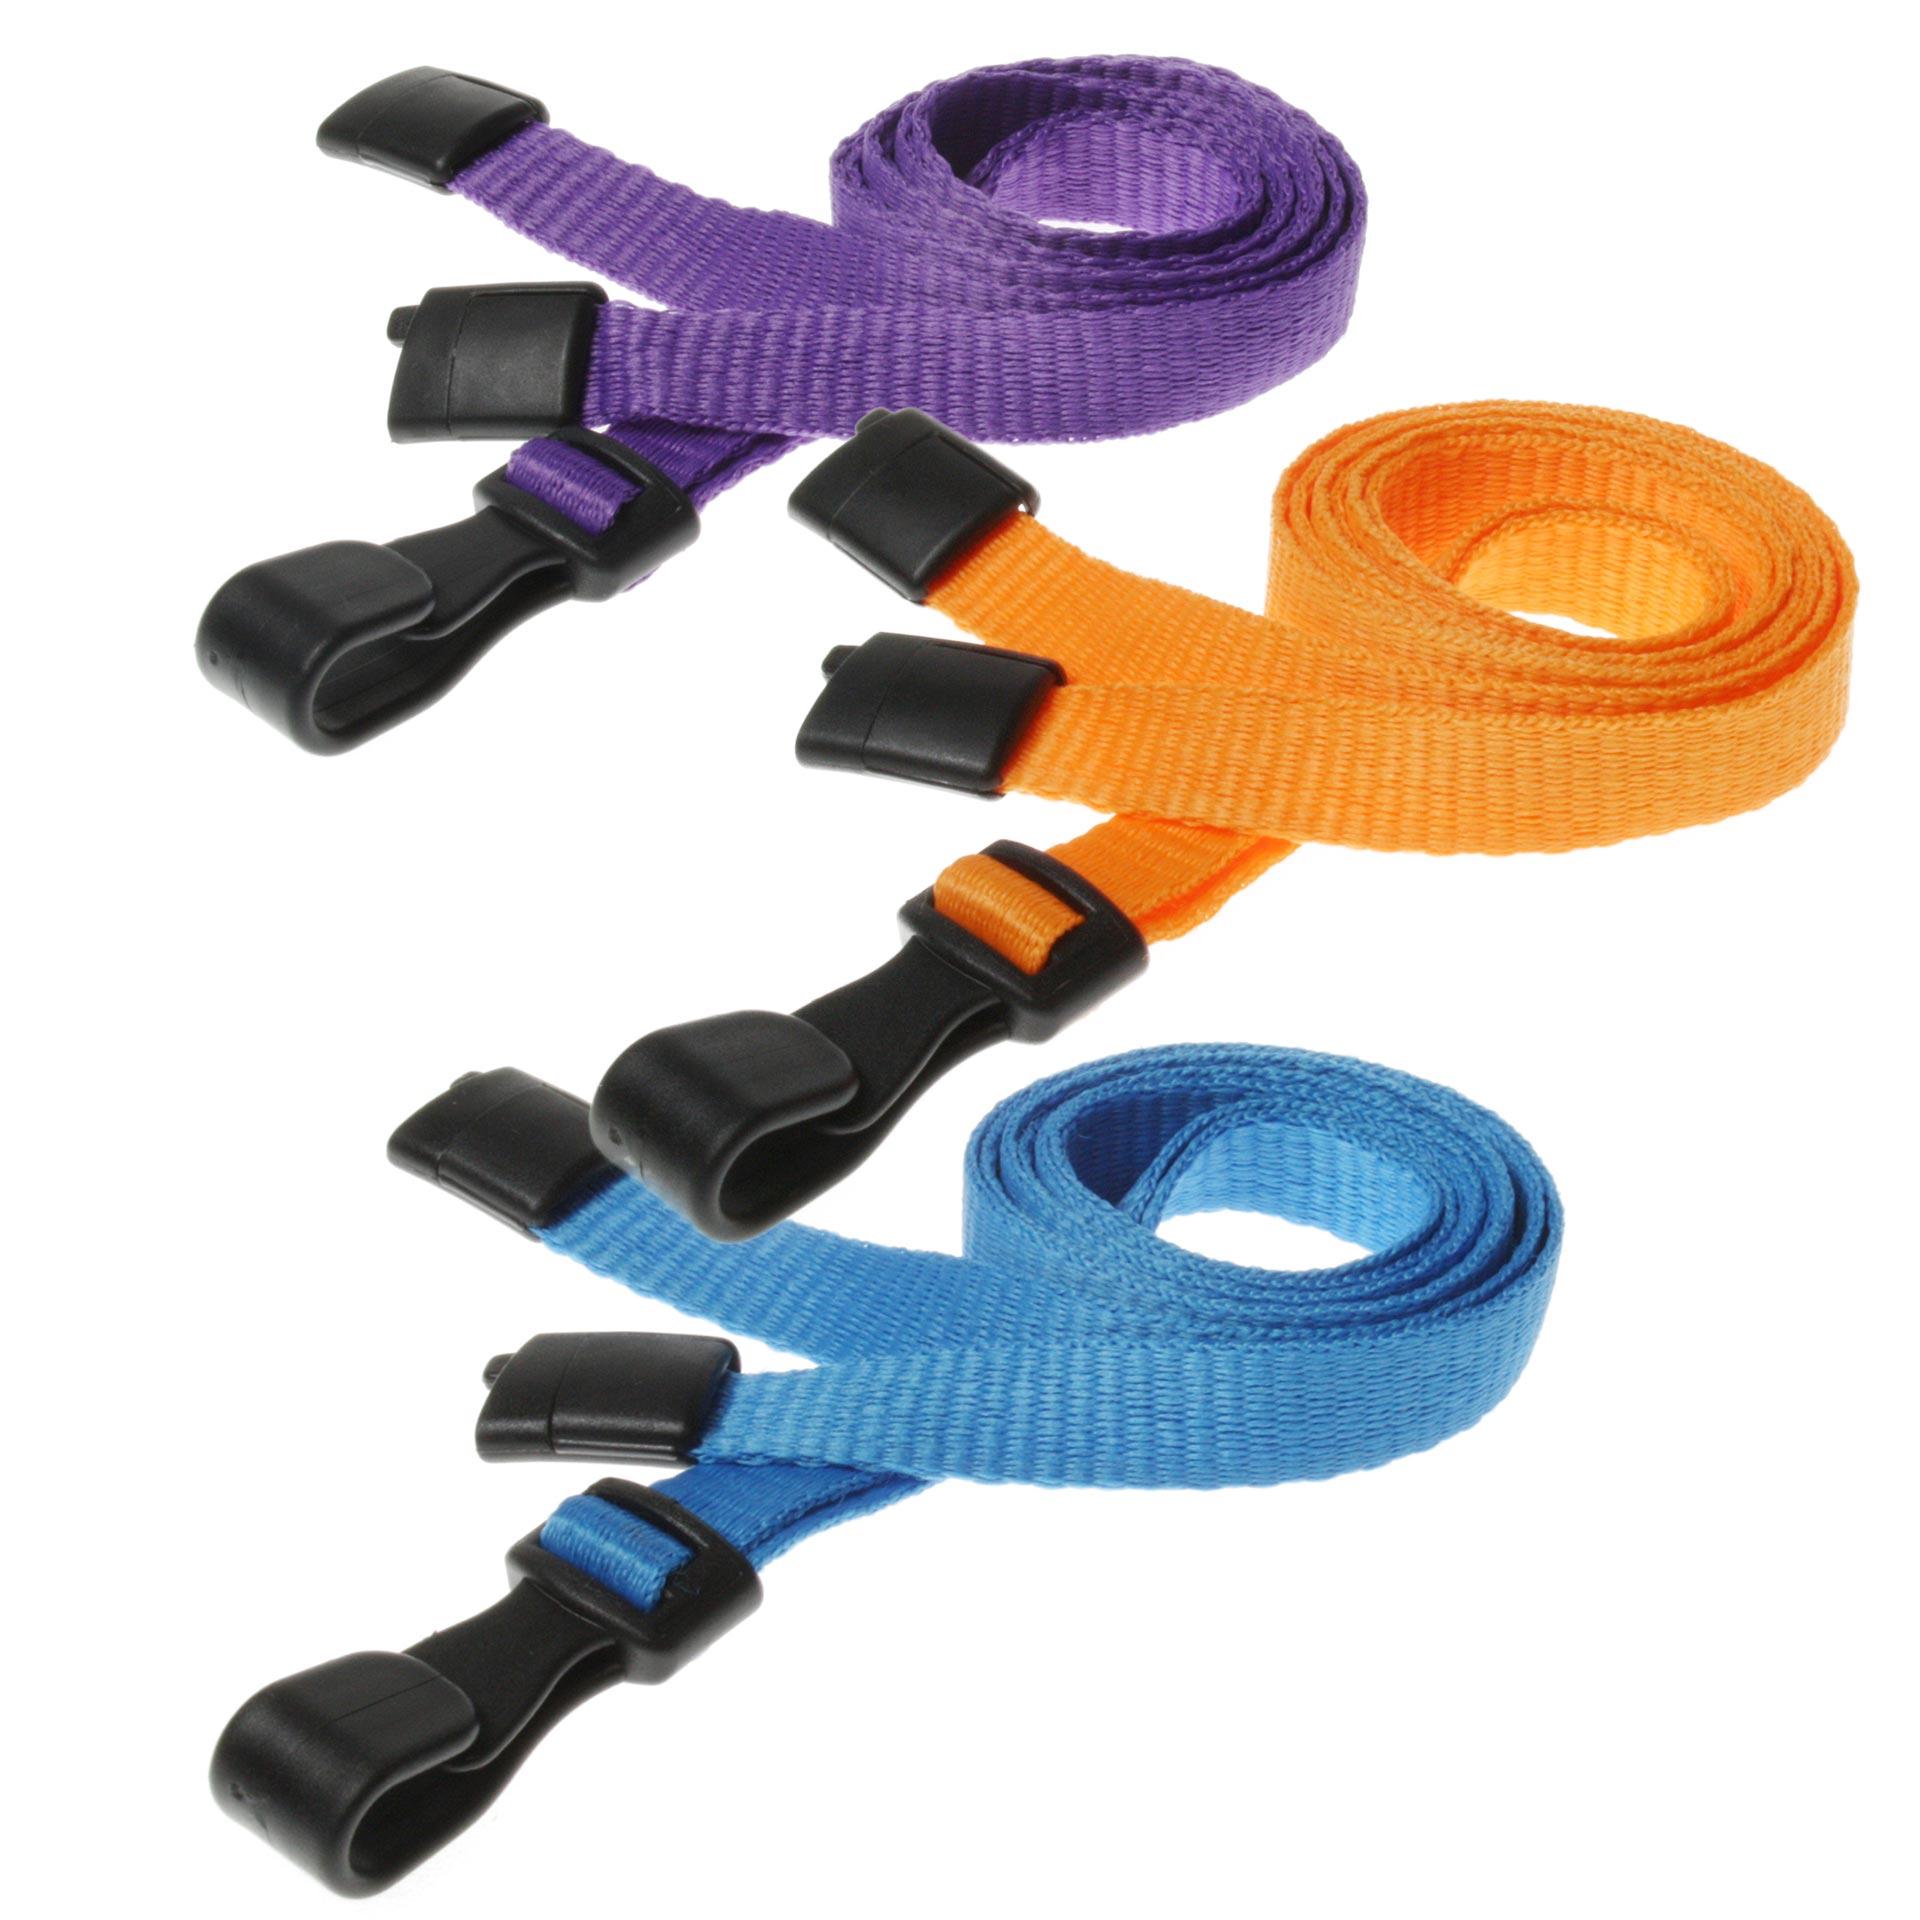 Plain Lanyards - Plastic Hook